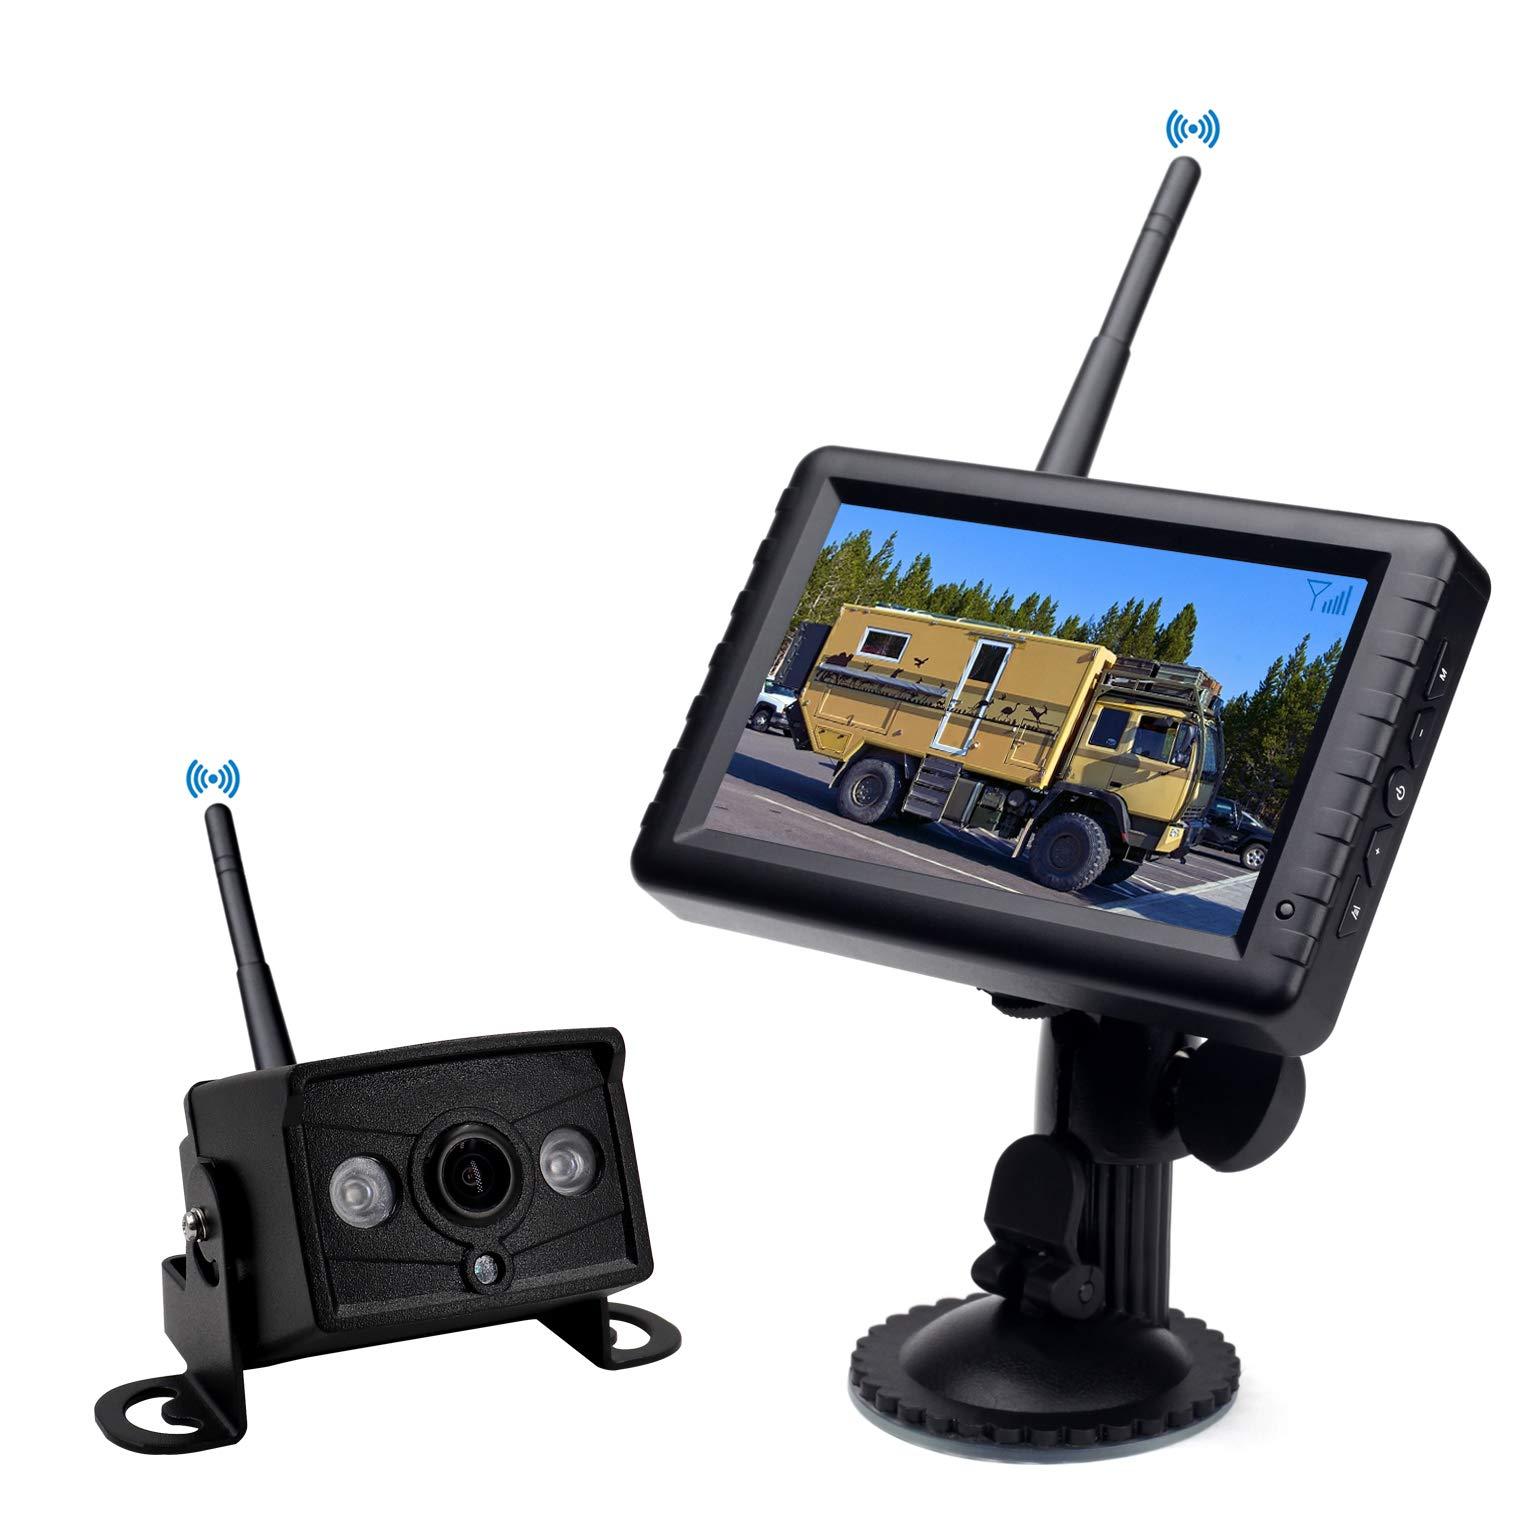 CAMONS HD Wireless Backup Camera Kit with Stable Digital Signal, 5'' Monitor & IP69K Waterproof IR Night Vision Front Rear View Camera for Truck, Van, Camping Car, SUV